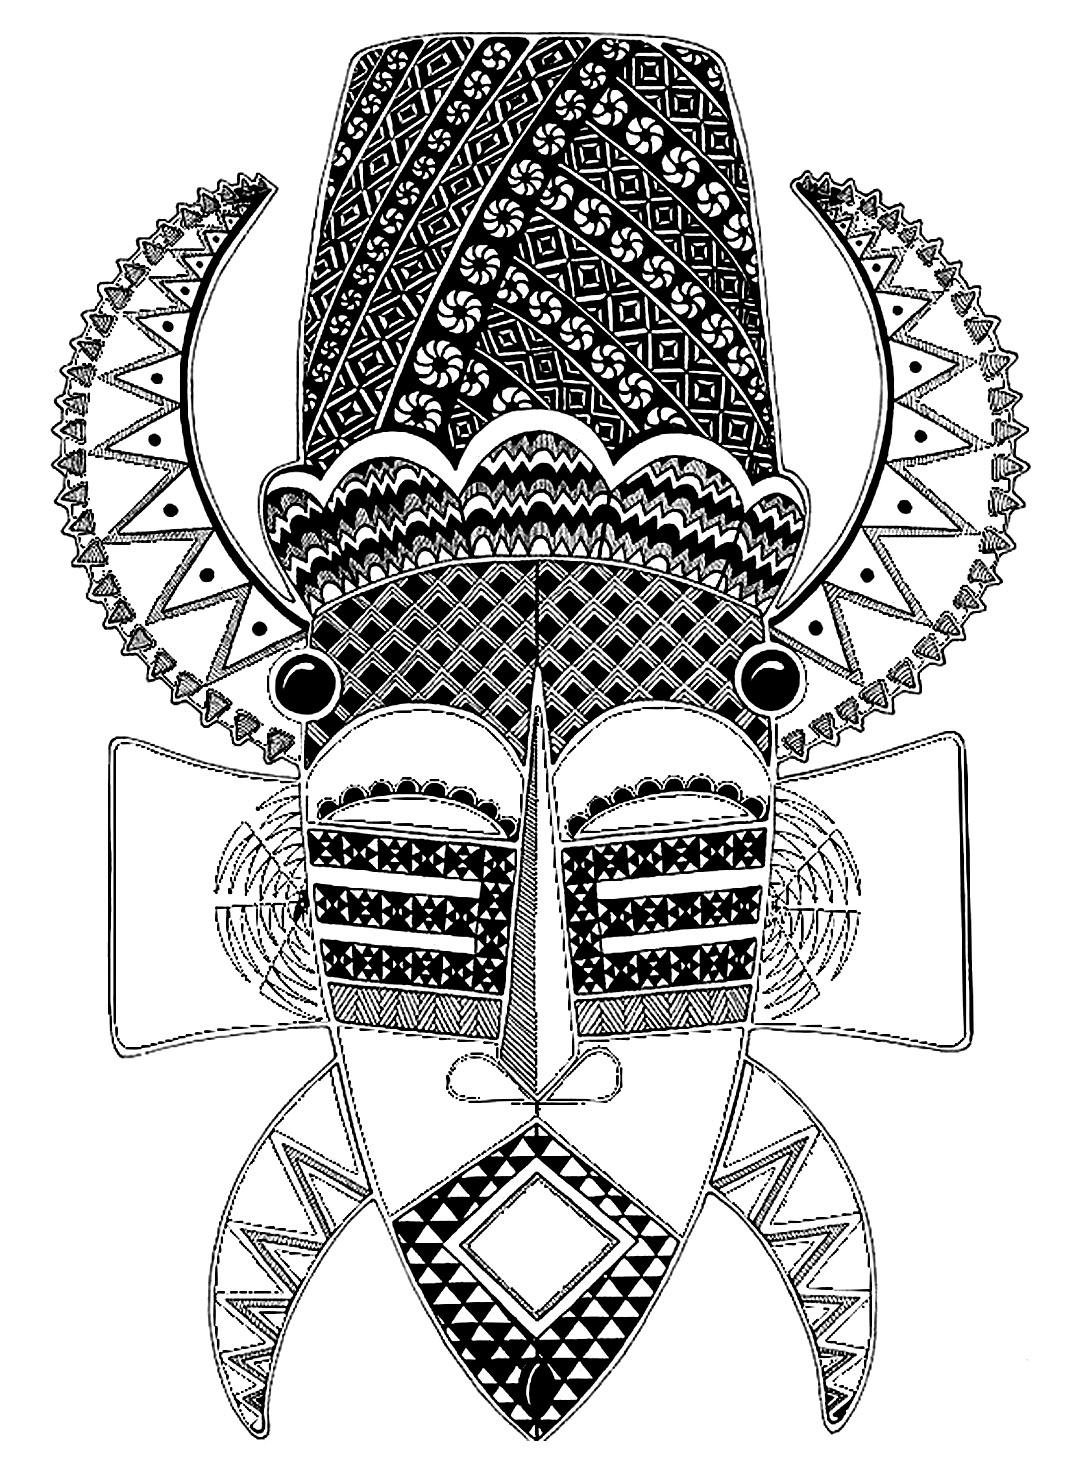 African mask, full of little details